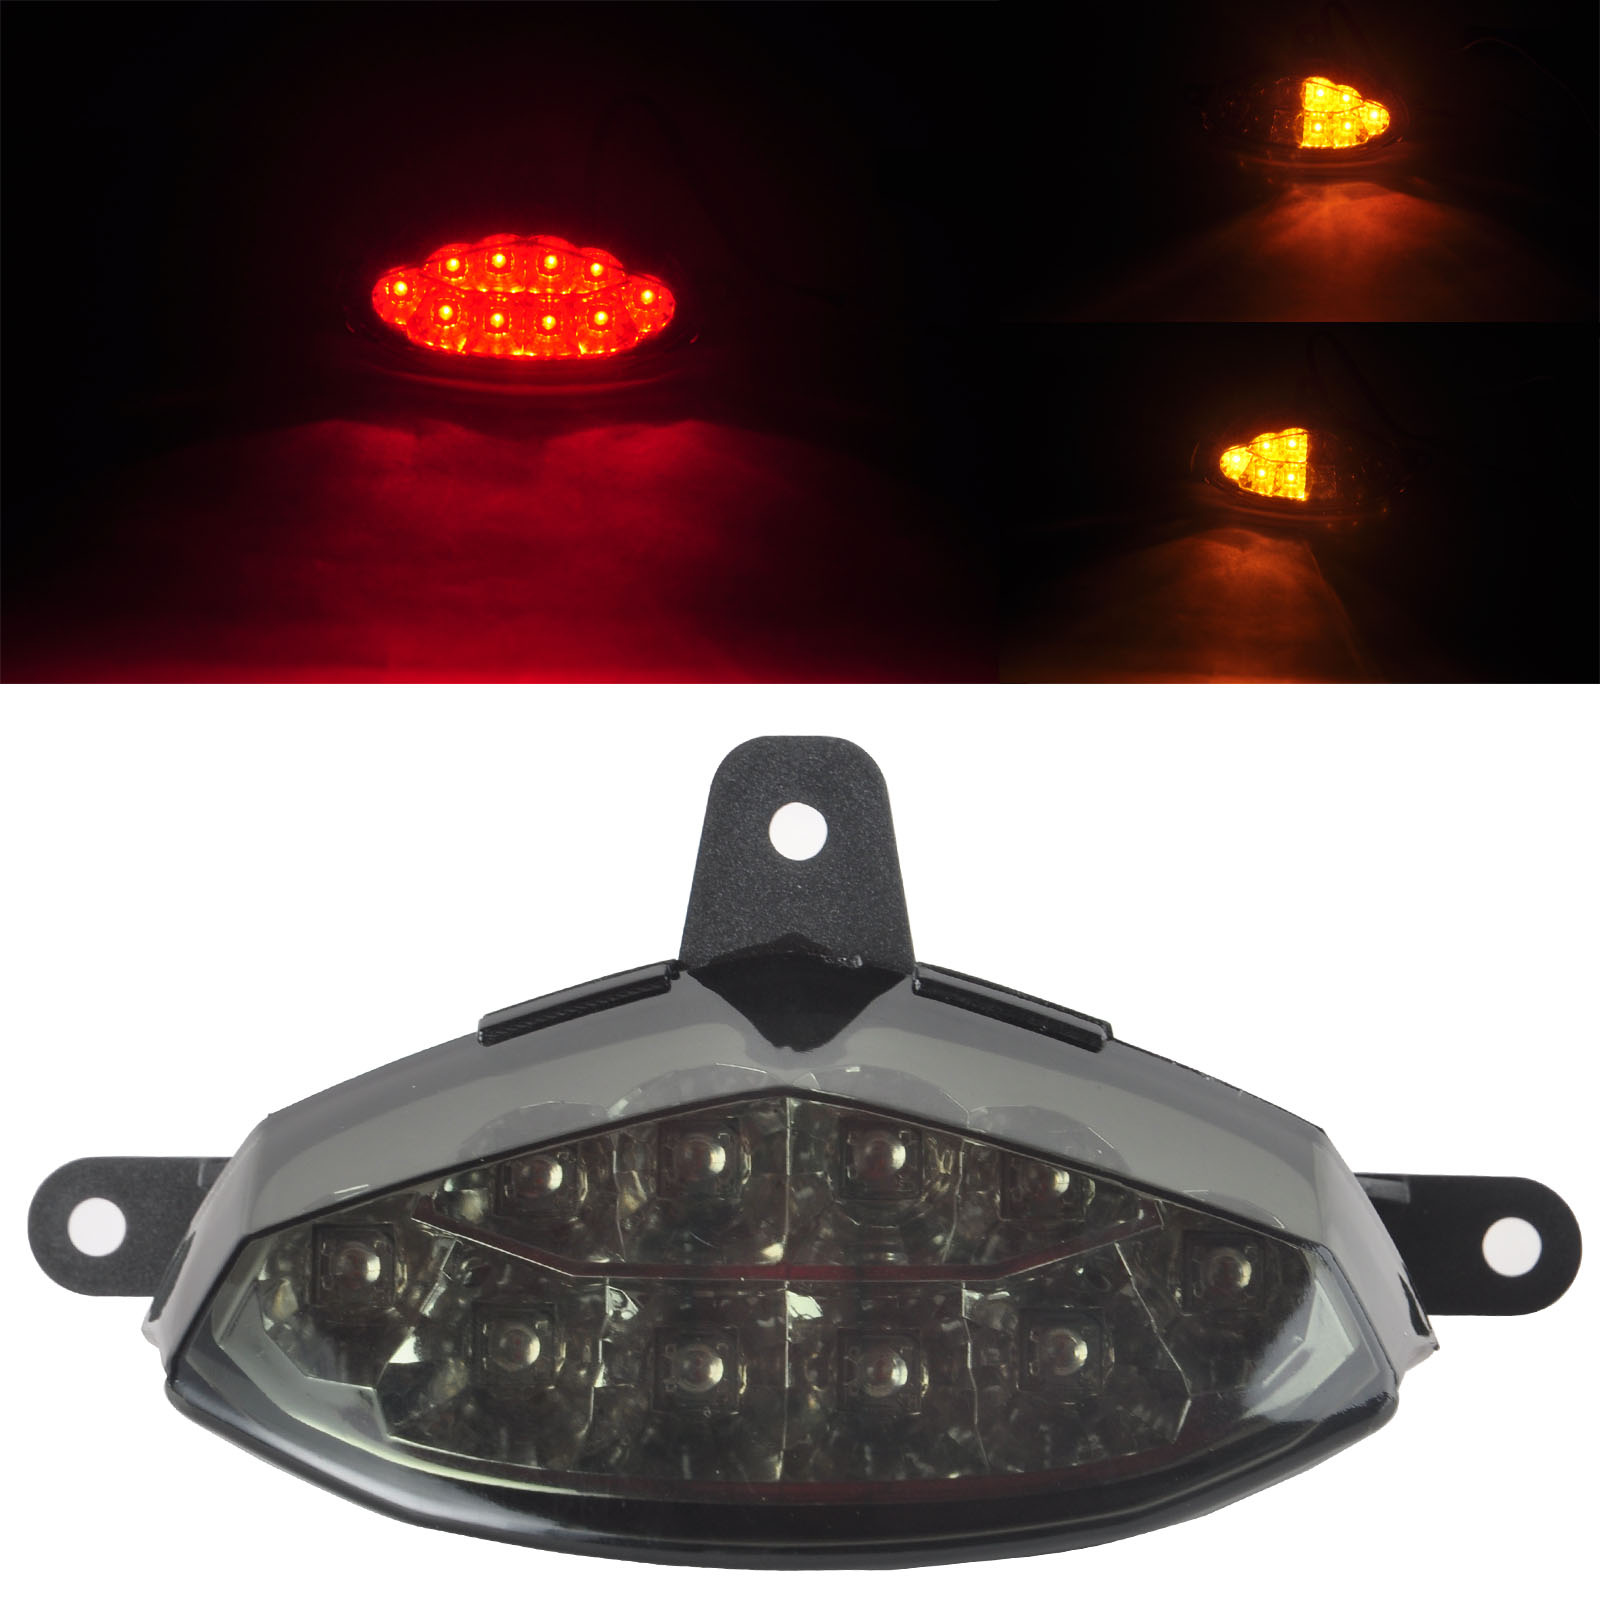 2016 New LED Tail Light Turning Signals Lamp Smoke Lens LED Tail Light For  KTM Duke